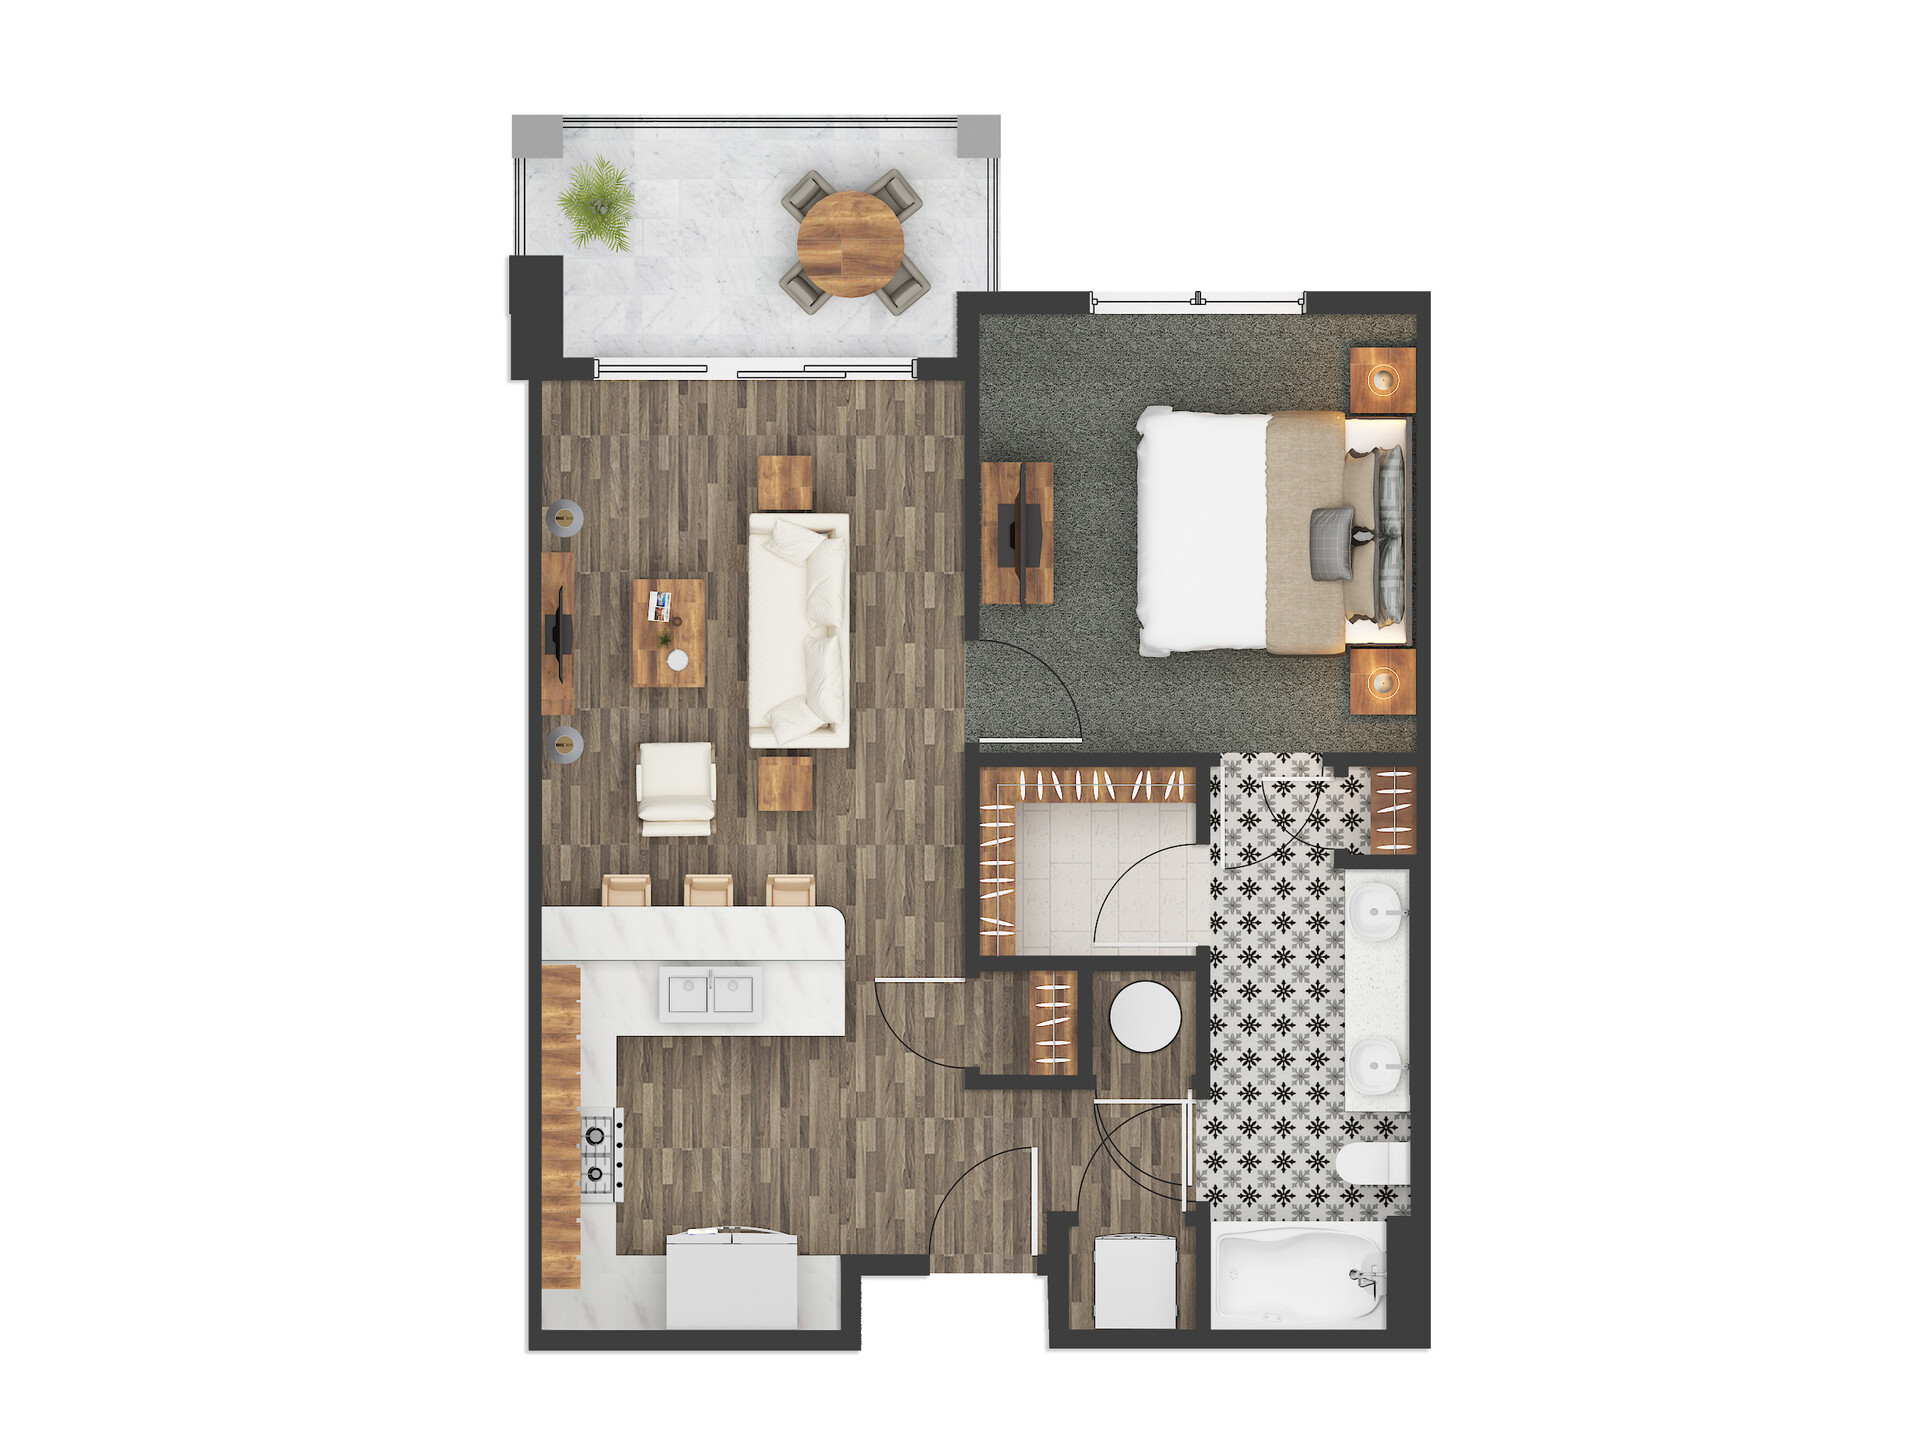 Jmsd Consultant Color Floor Plan Rendering For Austin Texas